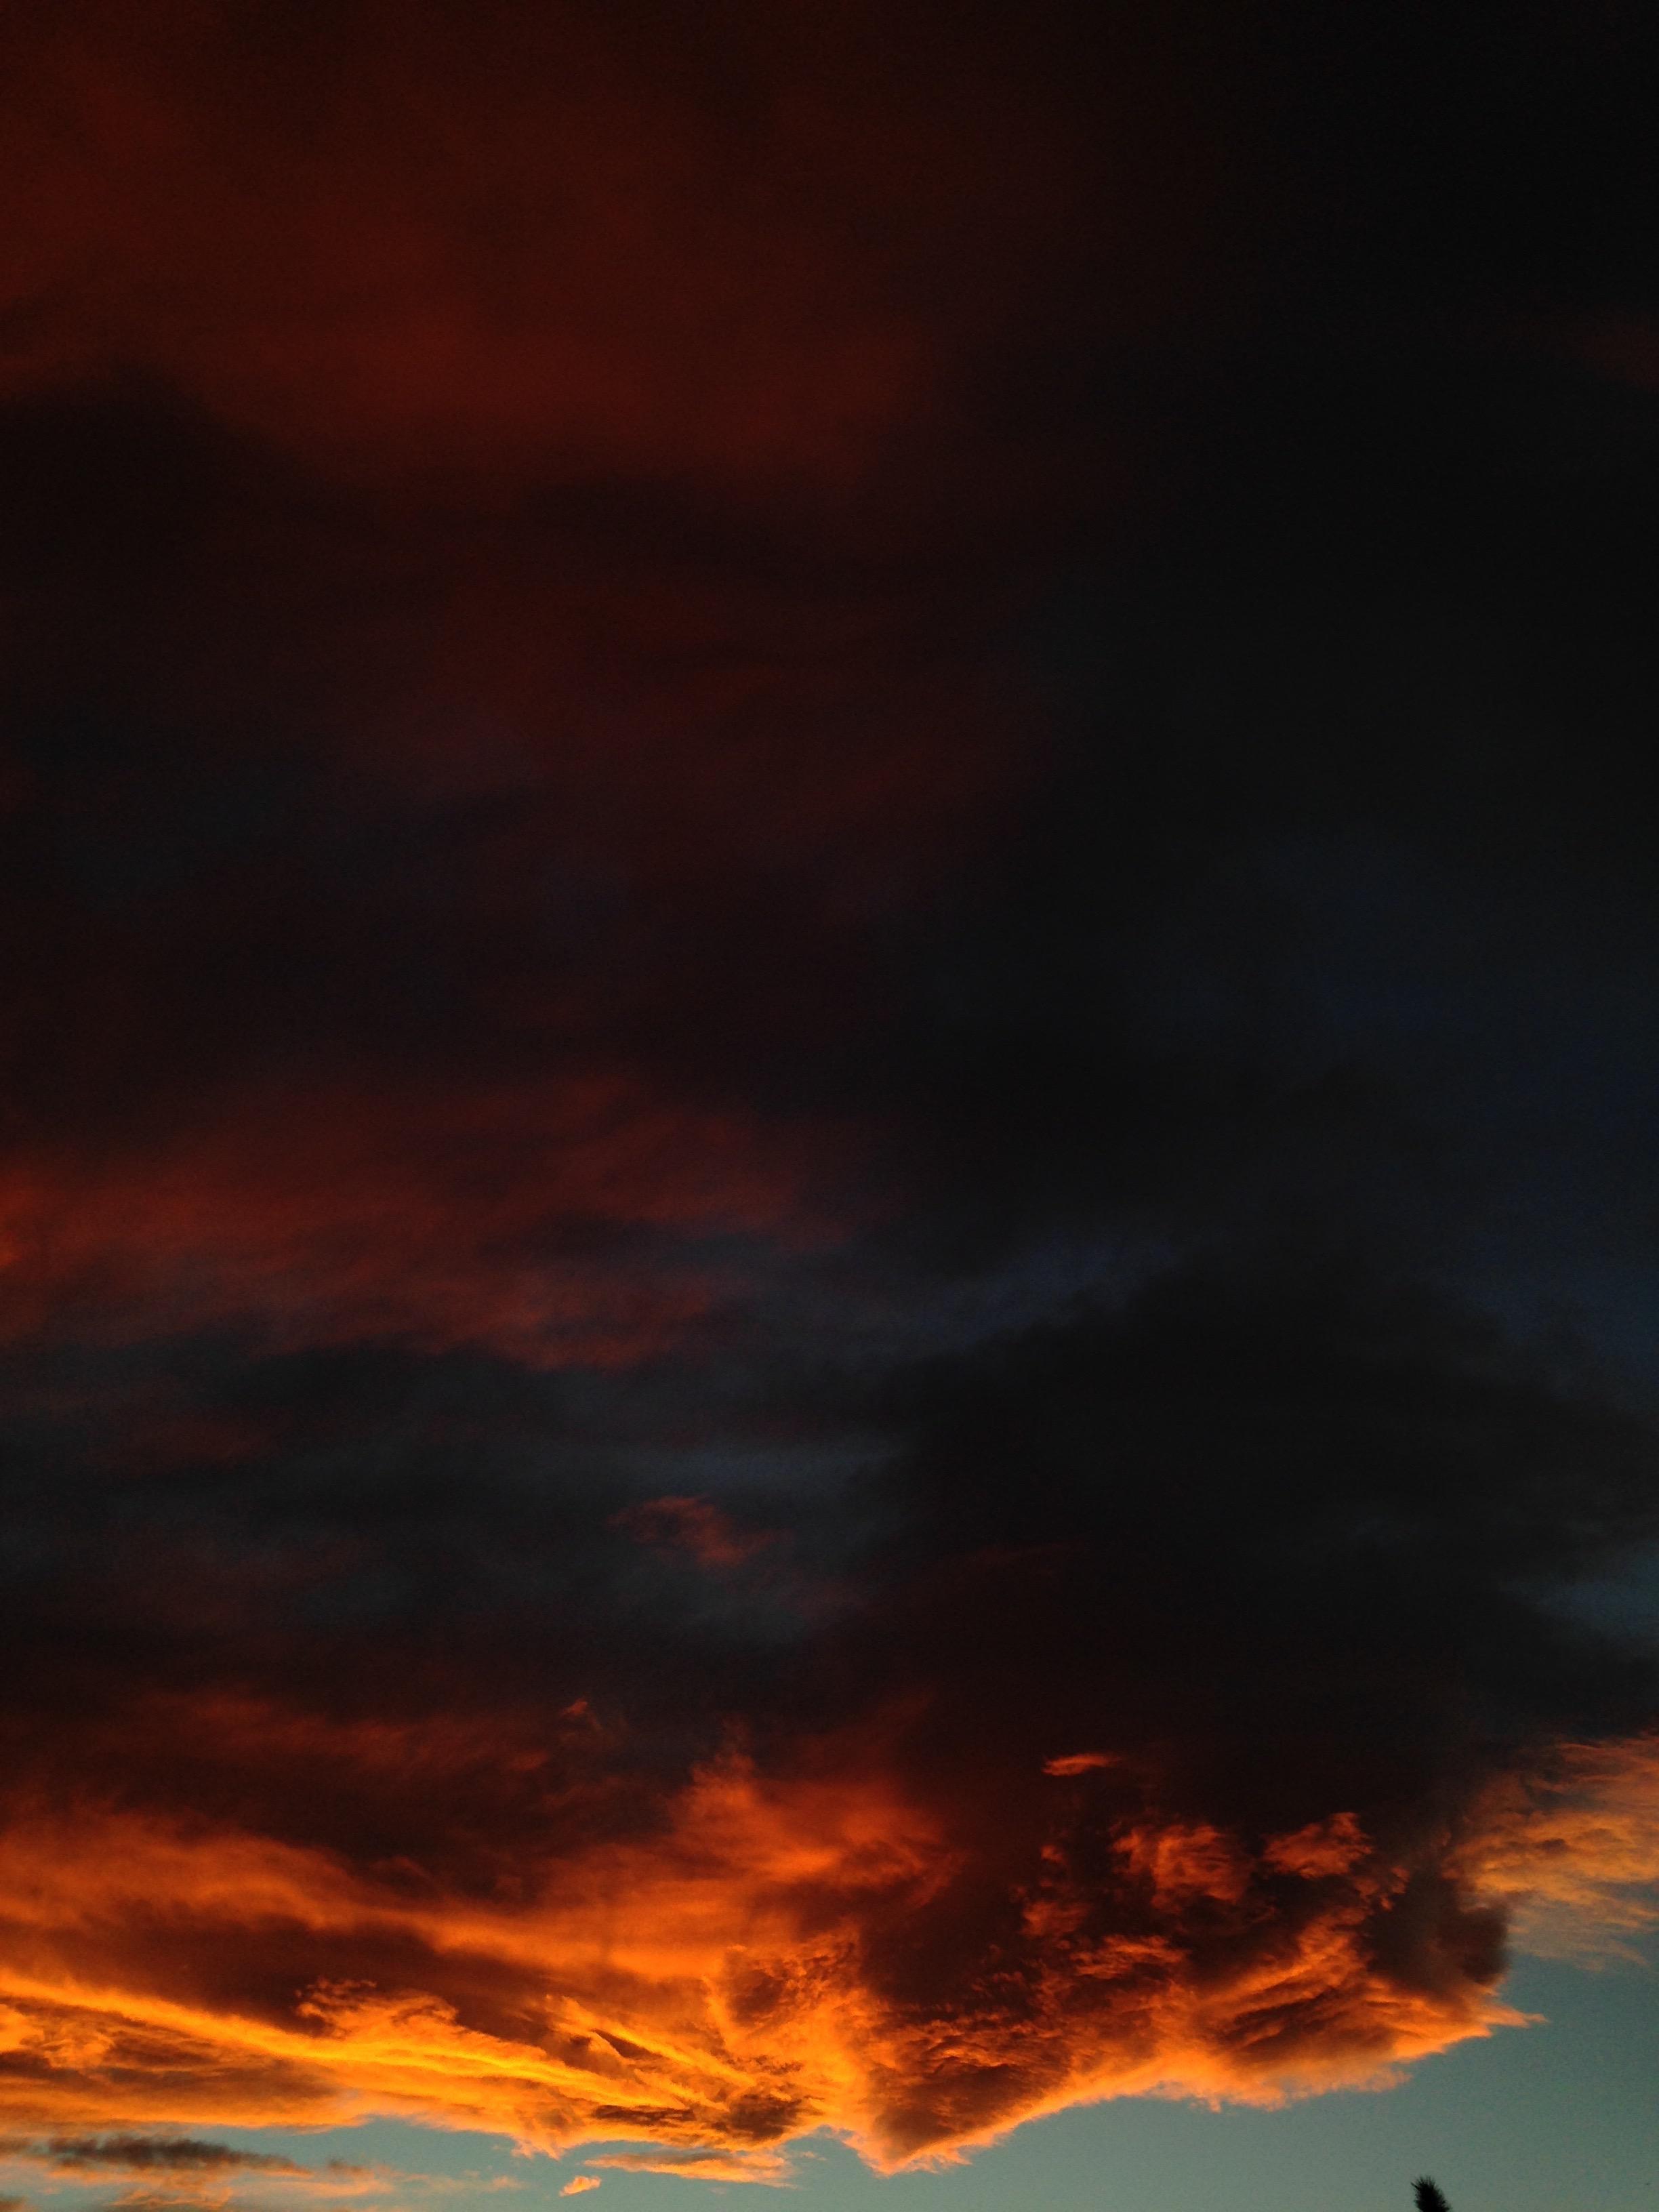 Most insane sky ever in Joshua Tree